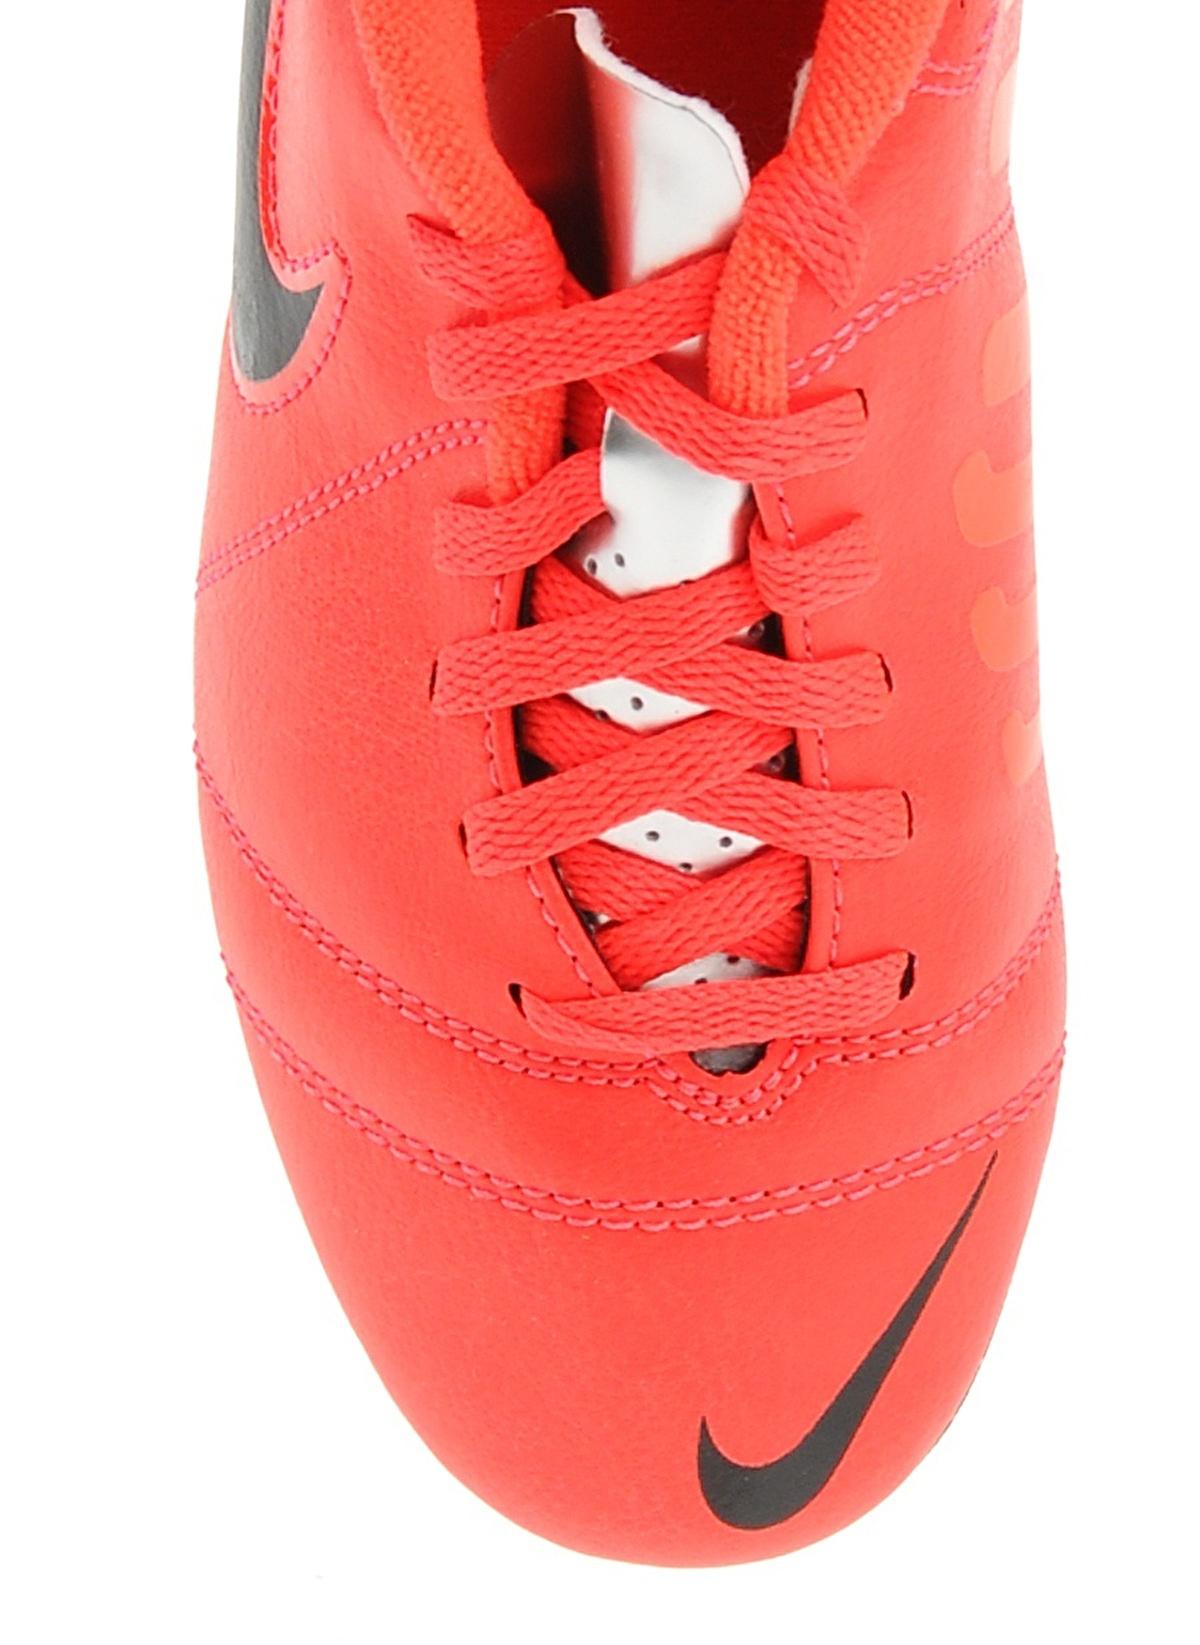 Nike Erkek Çocuk Jr Ctr360 Enganch Bright Crimson-Blck-Mtllc Slvr ... 5dc3acd48e71d